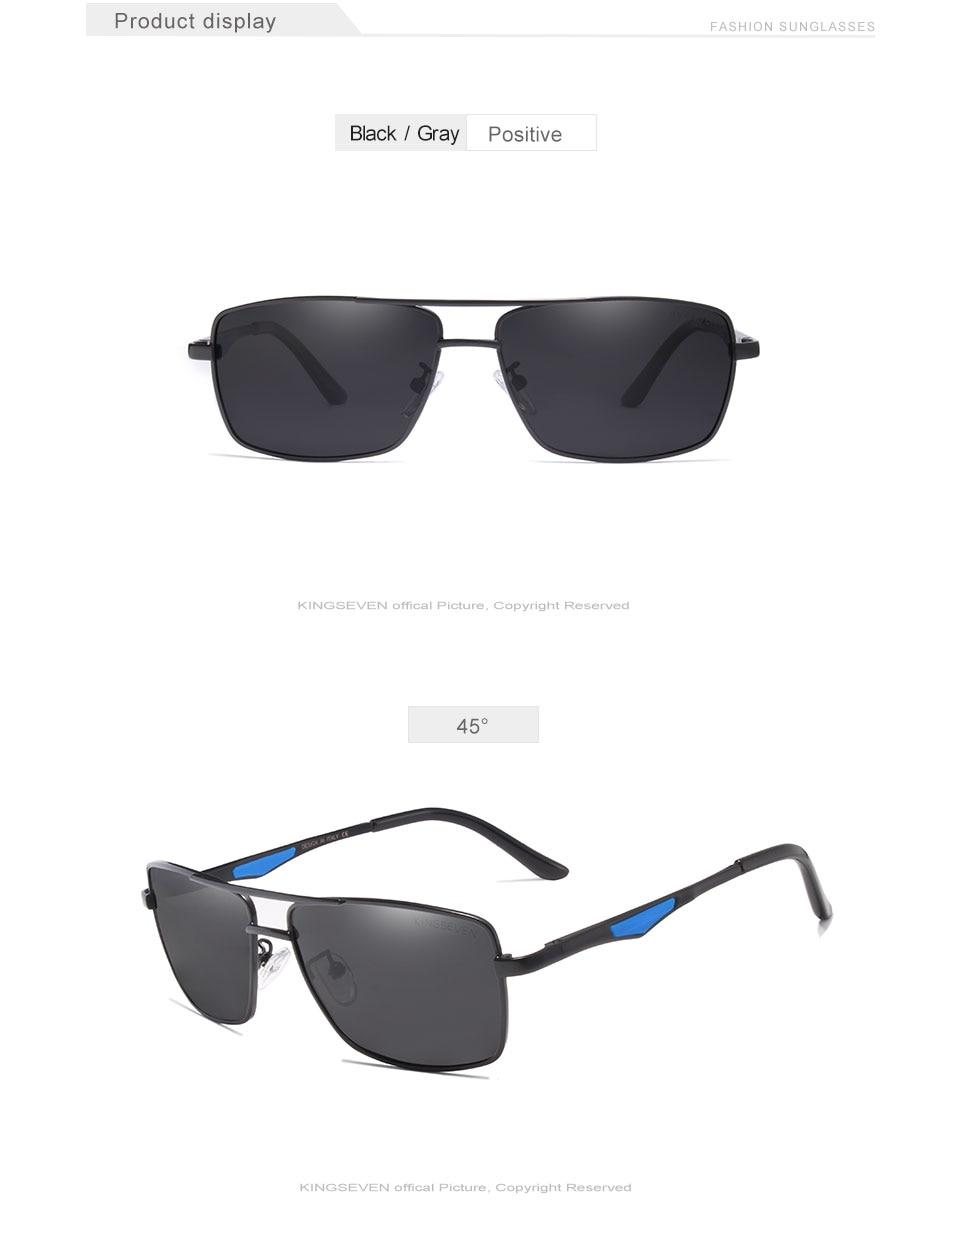 KINGSEVEN 2020 Brand Classic Square Polarized Sunglasses Men's Driving Male Sun Glasses Eyewear UV Blocking OculosN7906